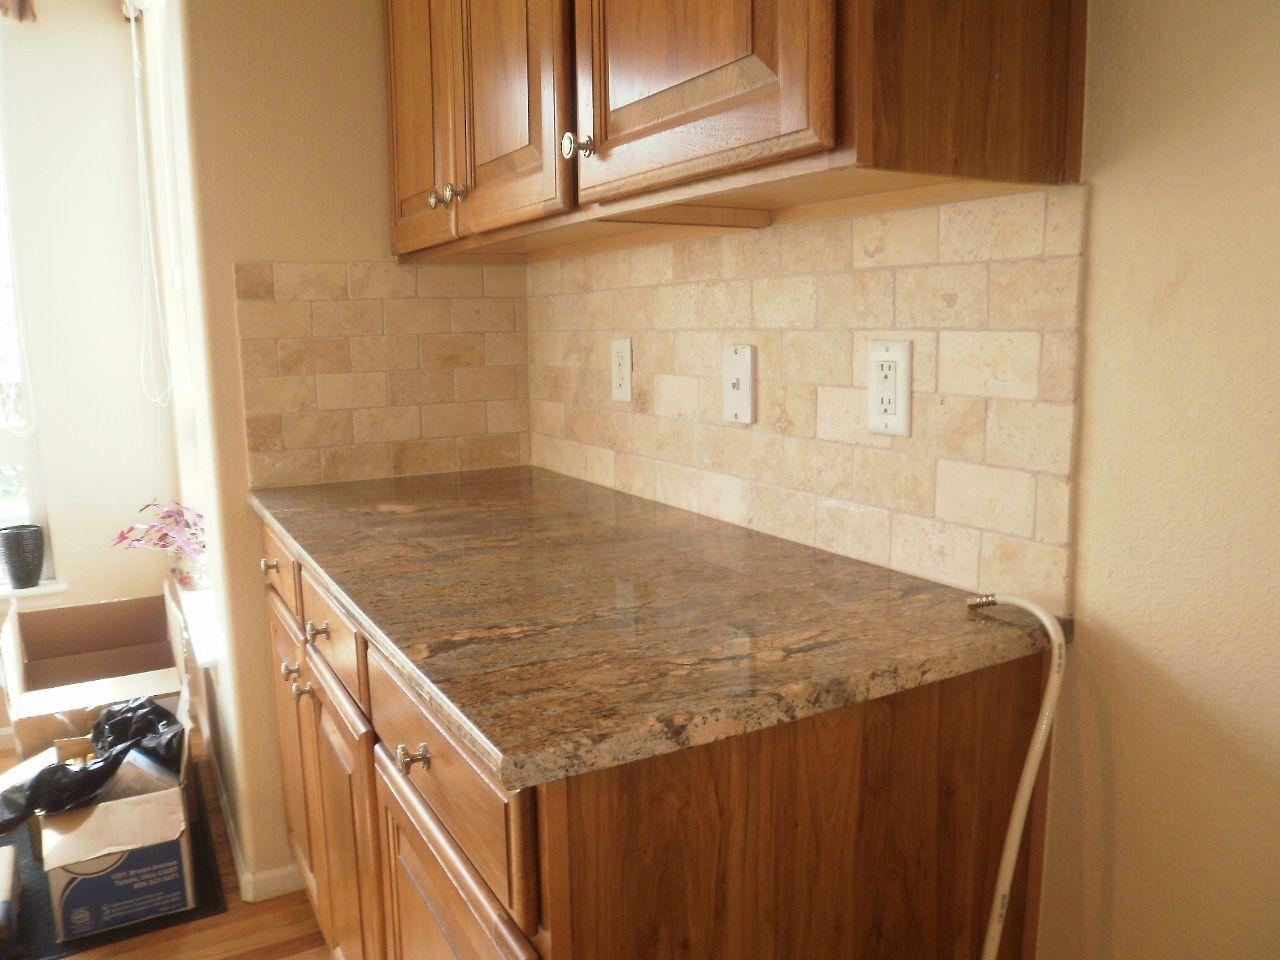 3x6 Tumbled Ivory Travertine Backsplash In Colorado Kitchen